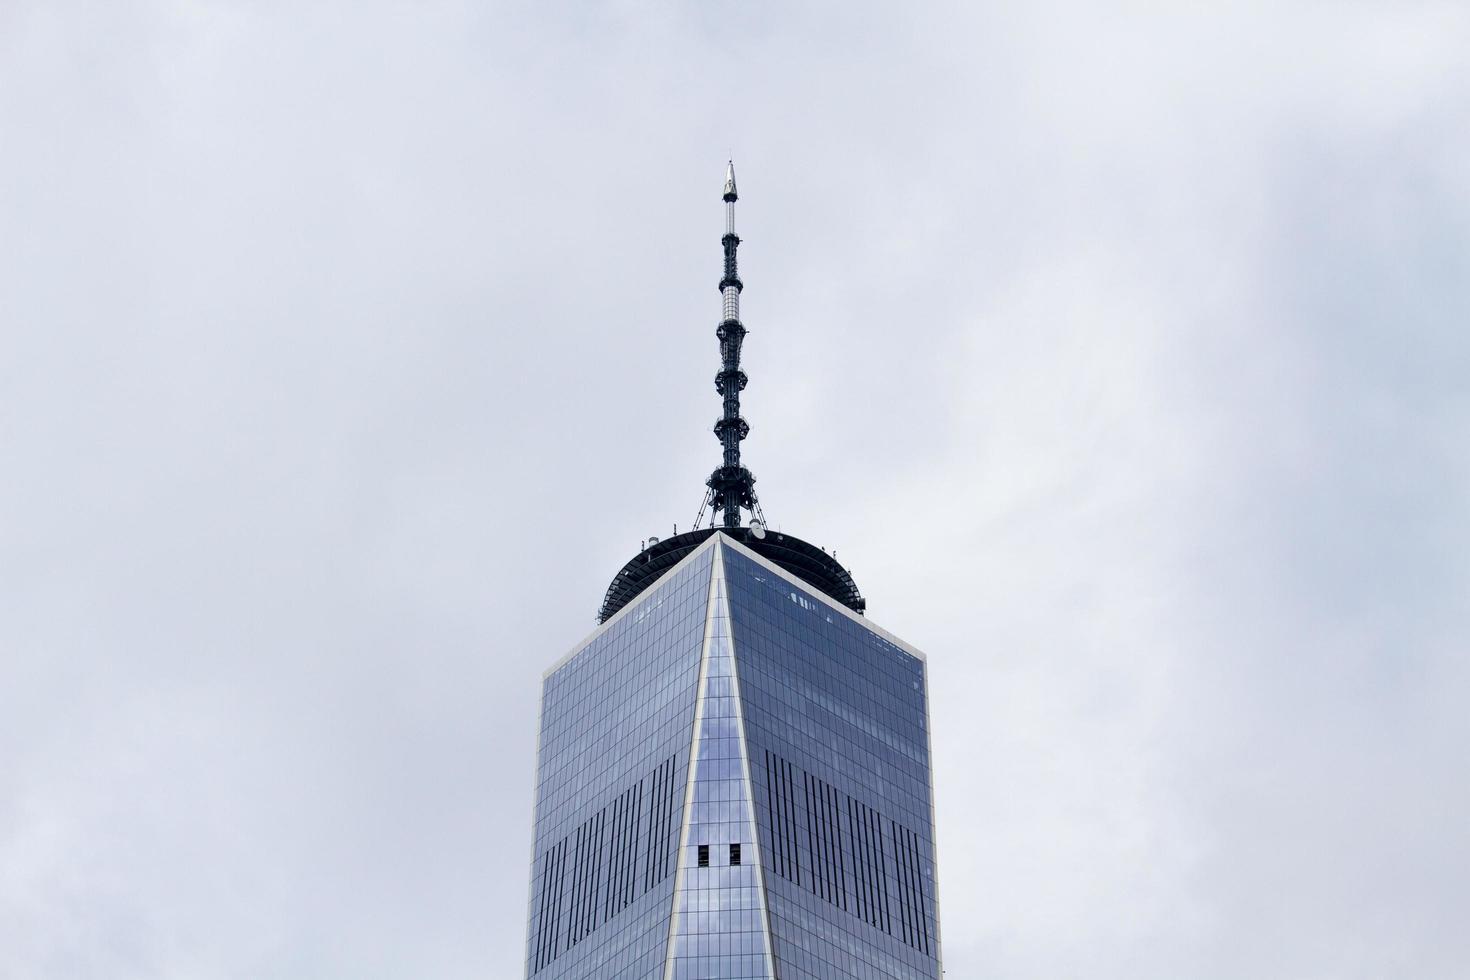 New York City, NY, 2020 - Top of The One World Trade Center photo